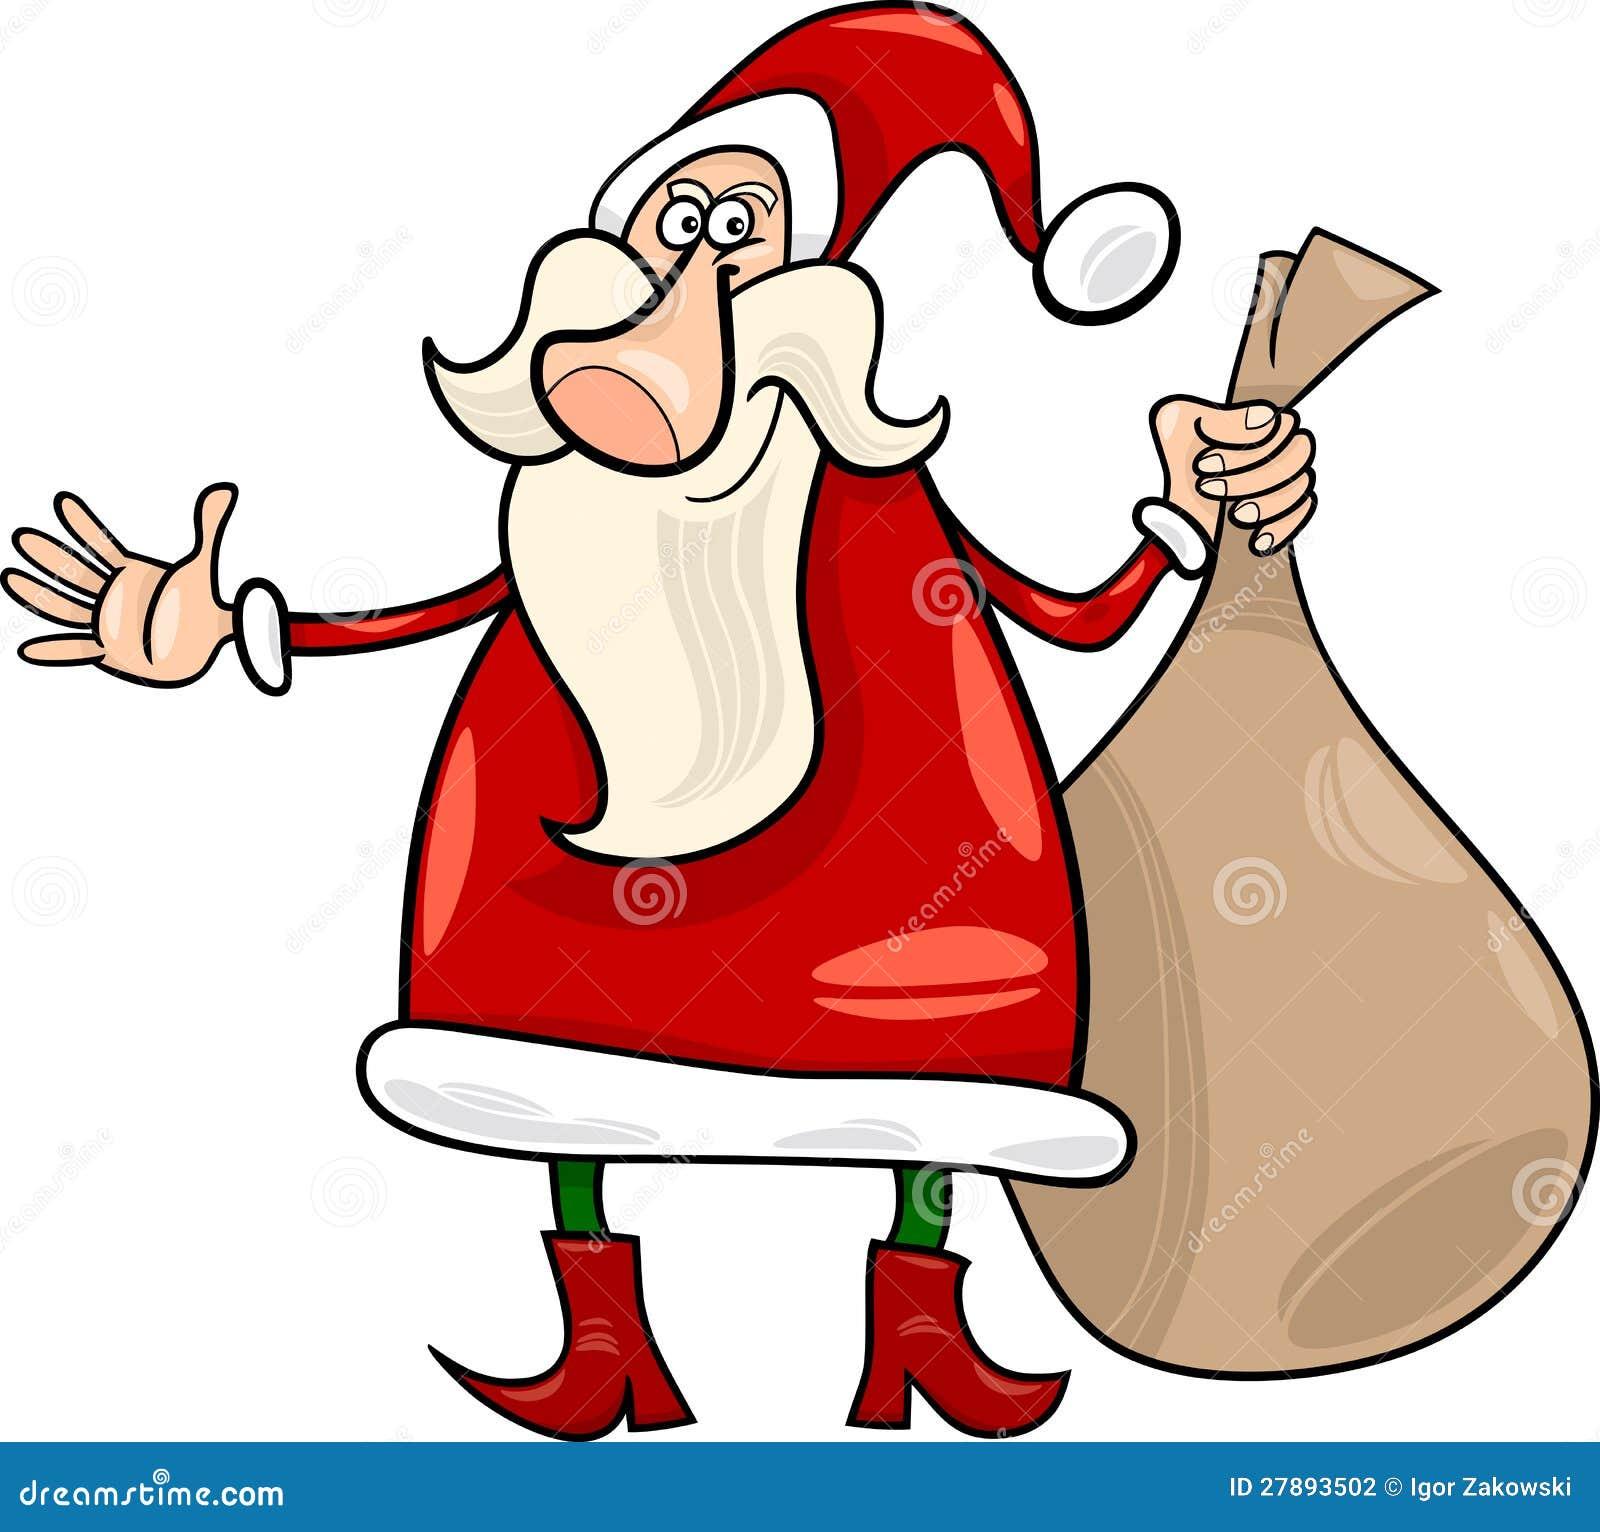 Cartoon Christmas Santa